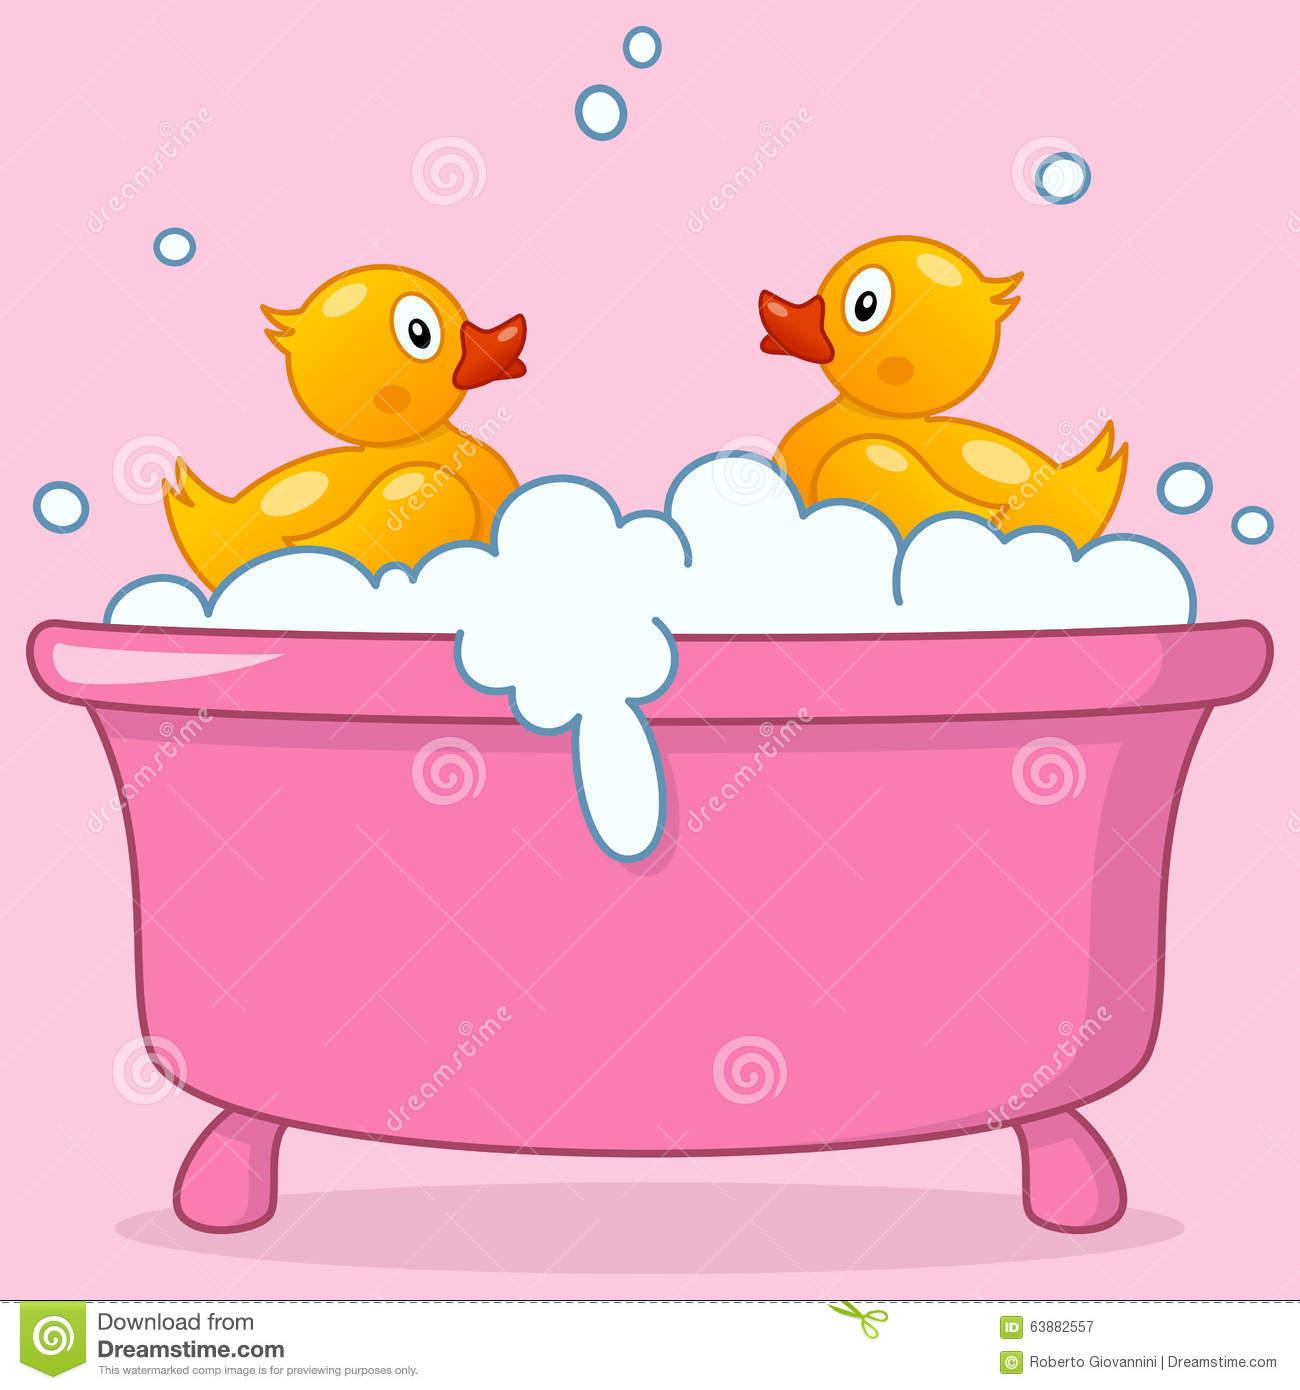 536 Bathtub free clipart.